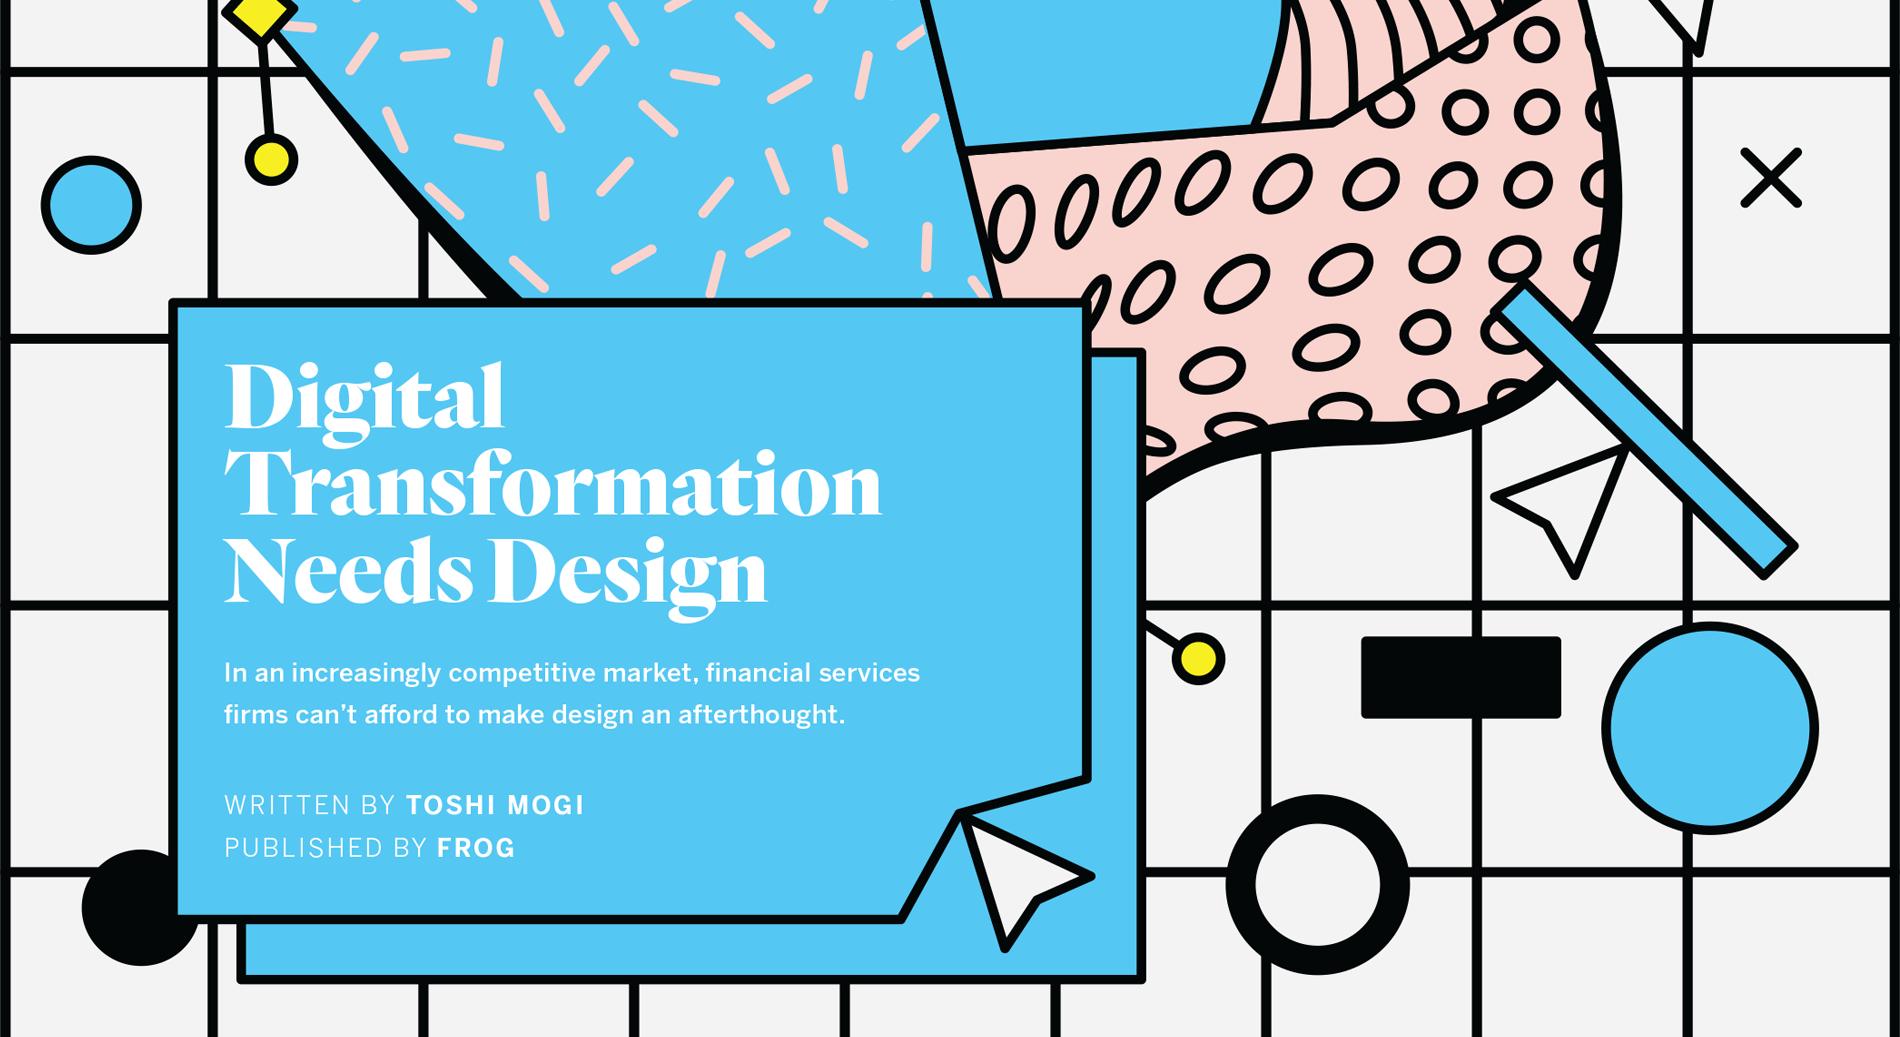 21_Digital_Transformation_Needs_Design